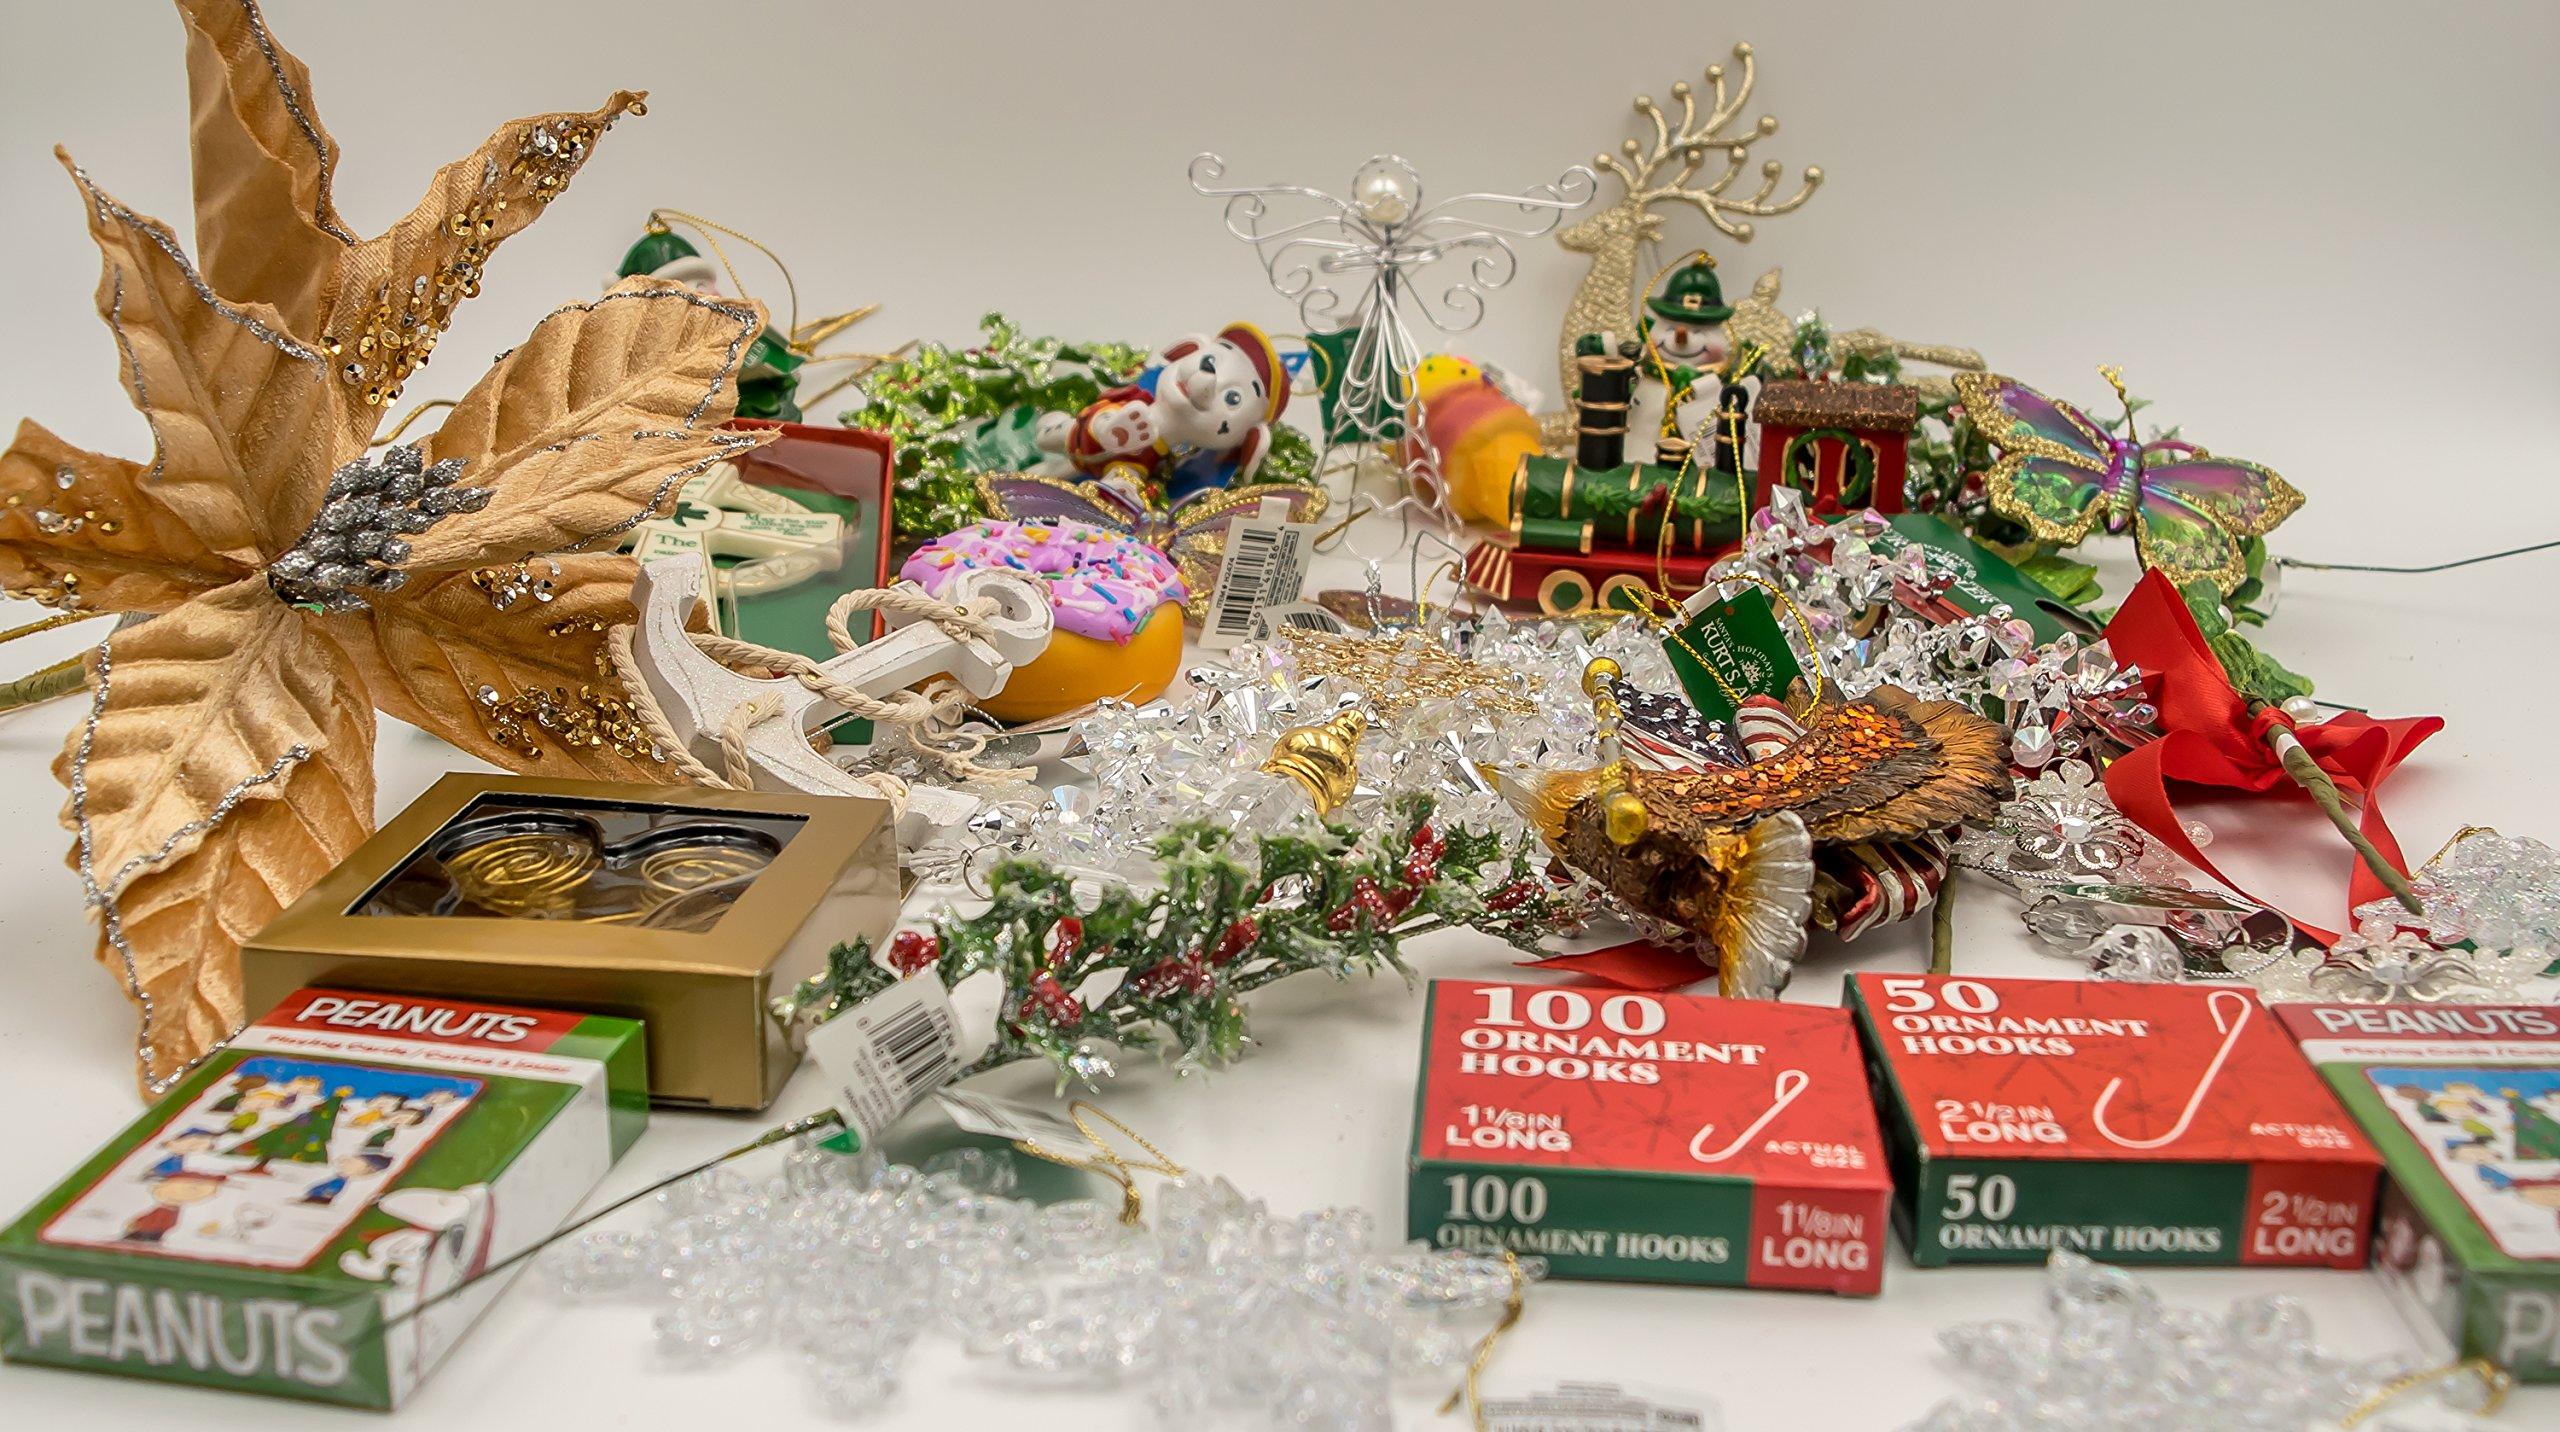 JZ Bundles Starter Set - Best of Christmas Option C - Kurt Adler - 37-Piece Bundle - A Bundle of Christmas Ornaments Great Gift by JZ Bundles (Image #5)